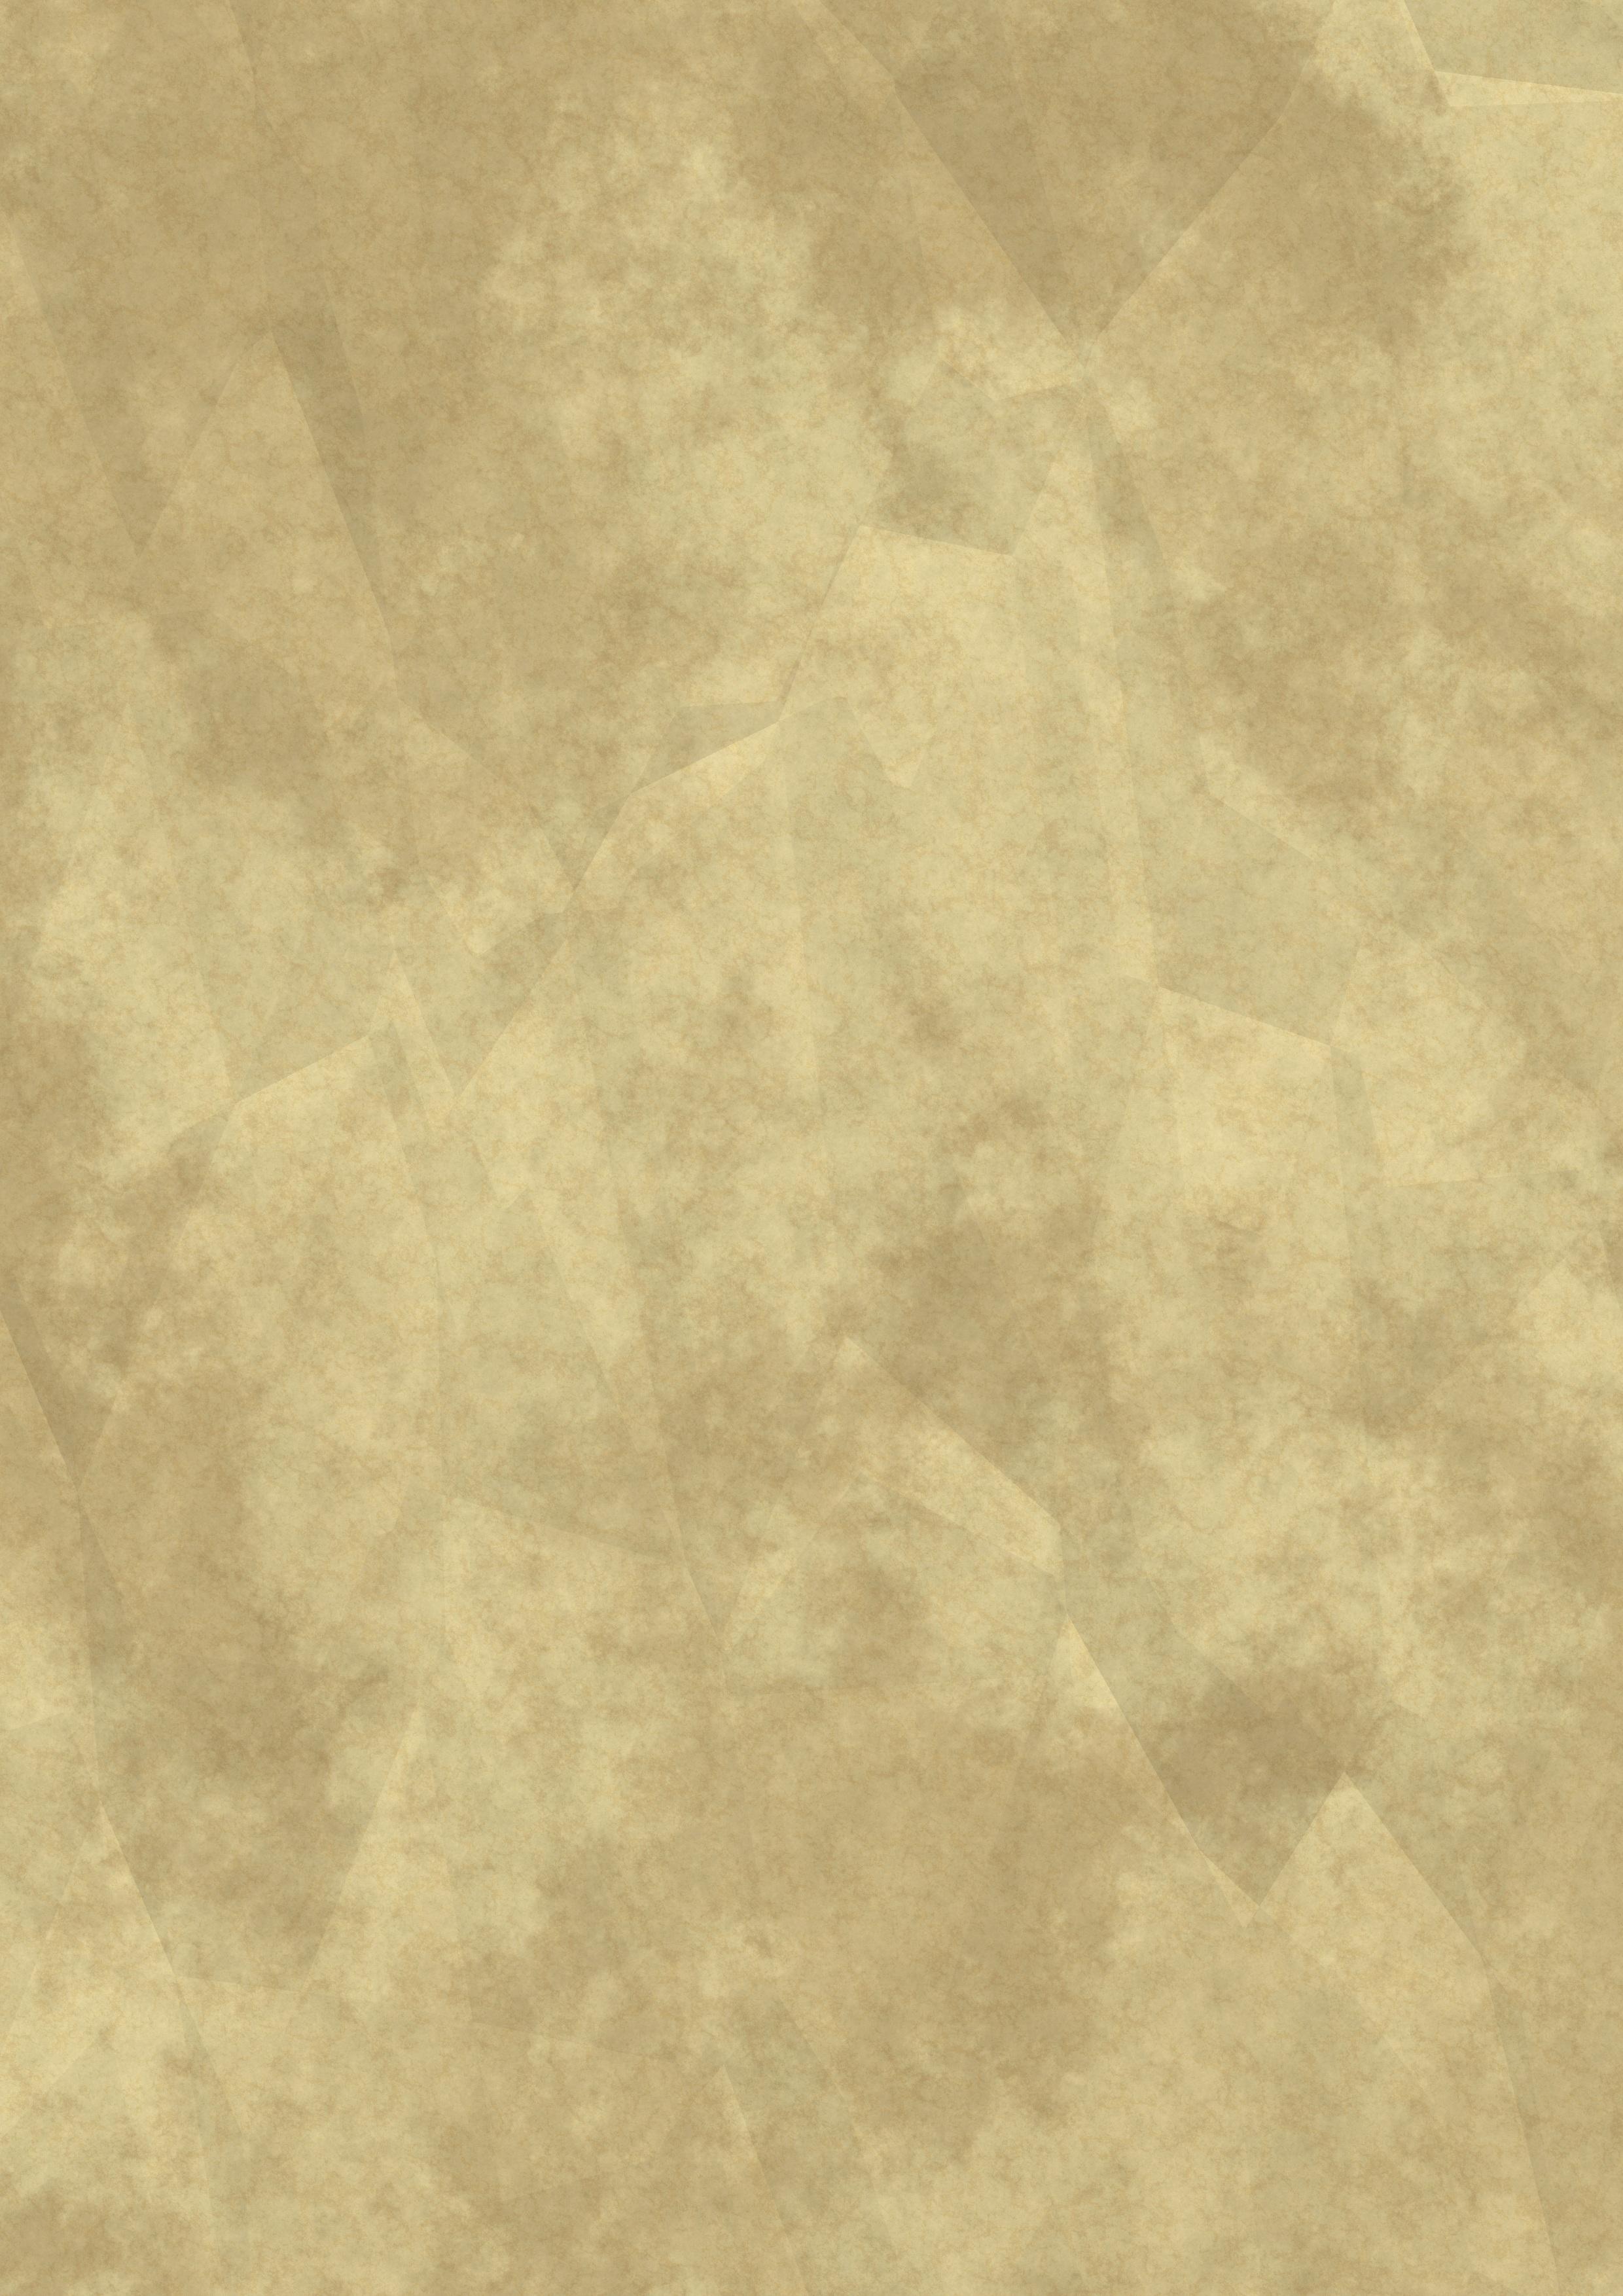 Struktur Tekstur Lantai Pola Garis Coklat Ubin Kosong Kuning Kertas Lingkaran Perkamen Latar Belakang Krem Melipat Public Domain